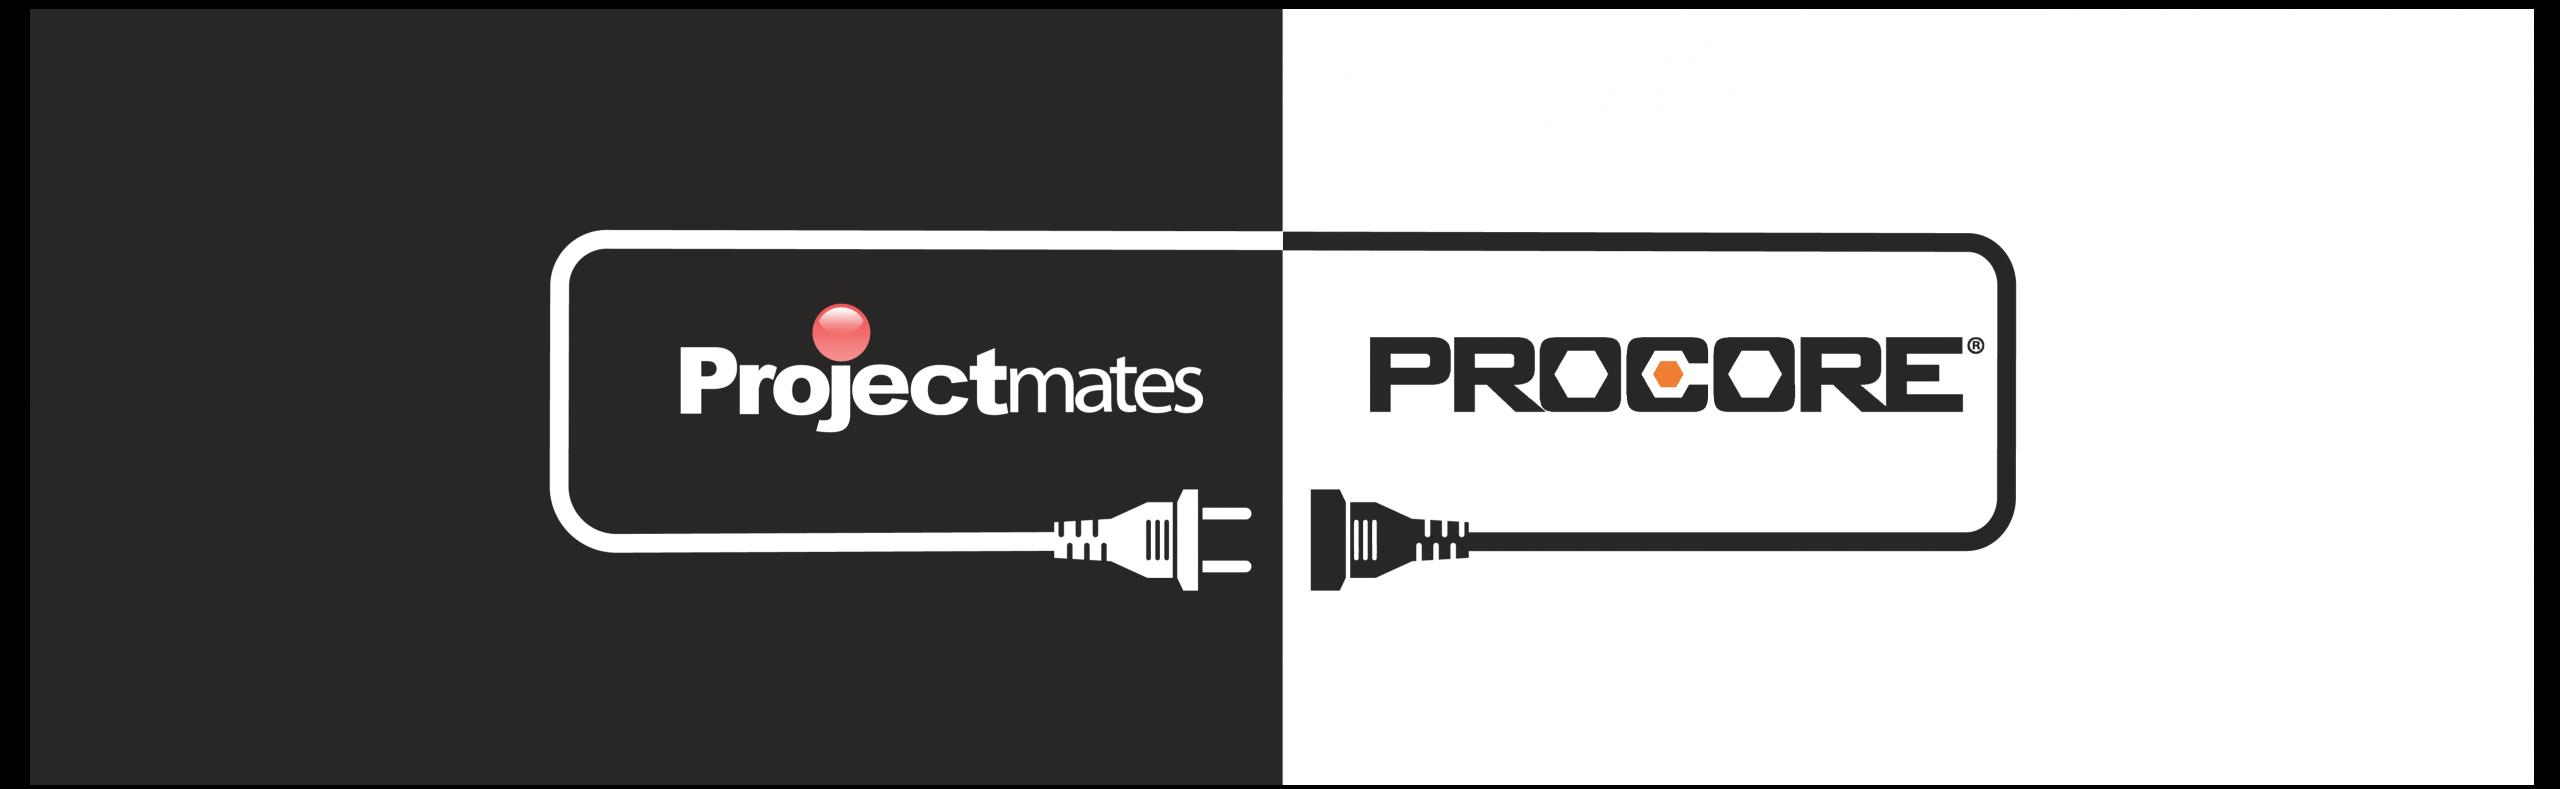 Projectmates Procore Integration